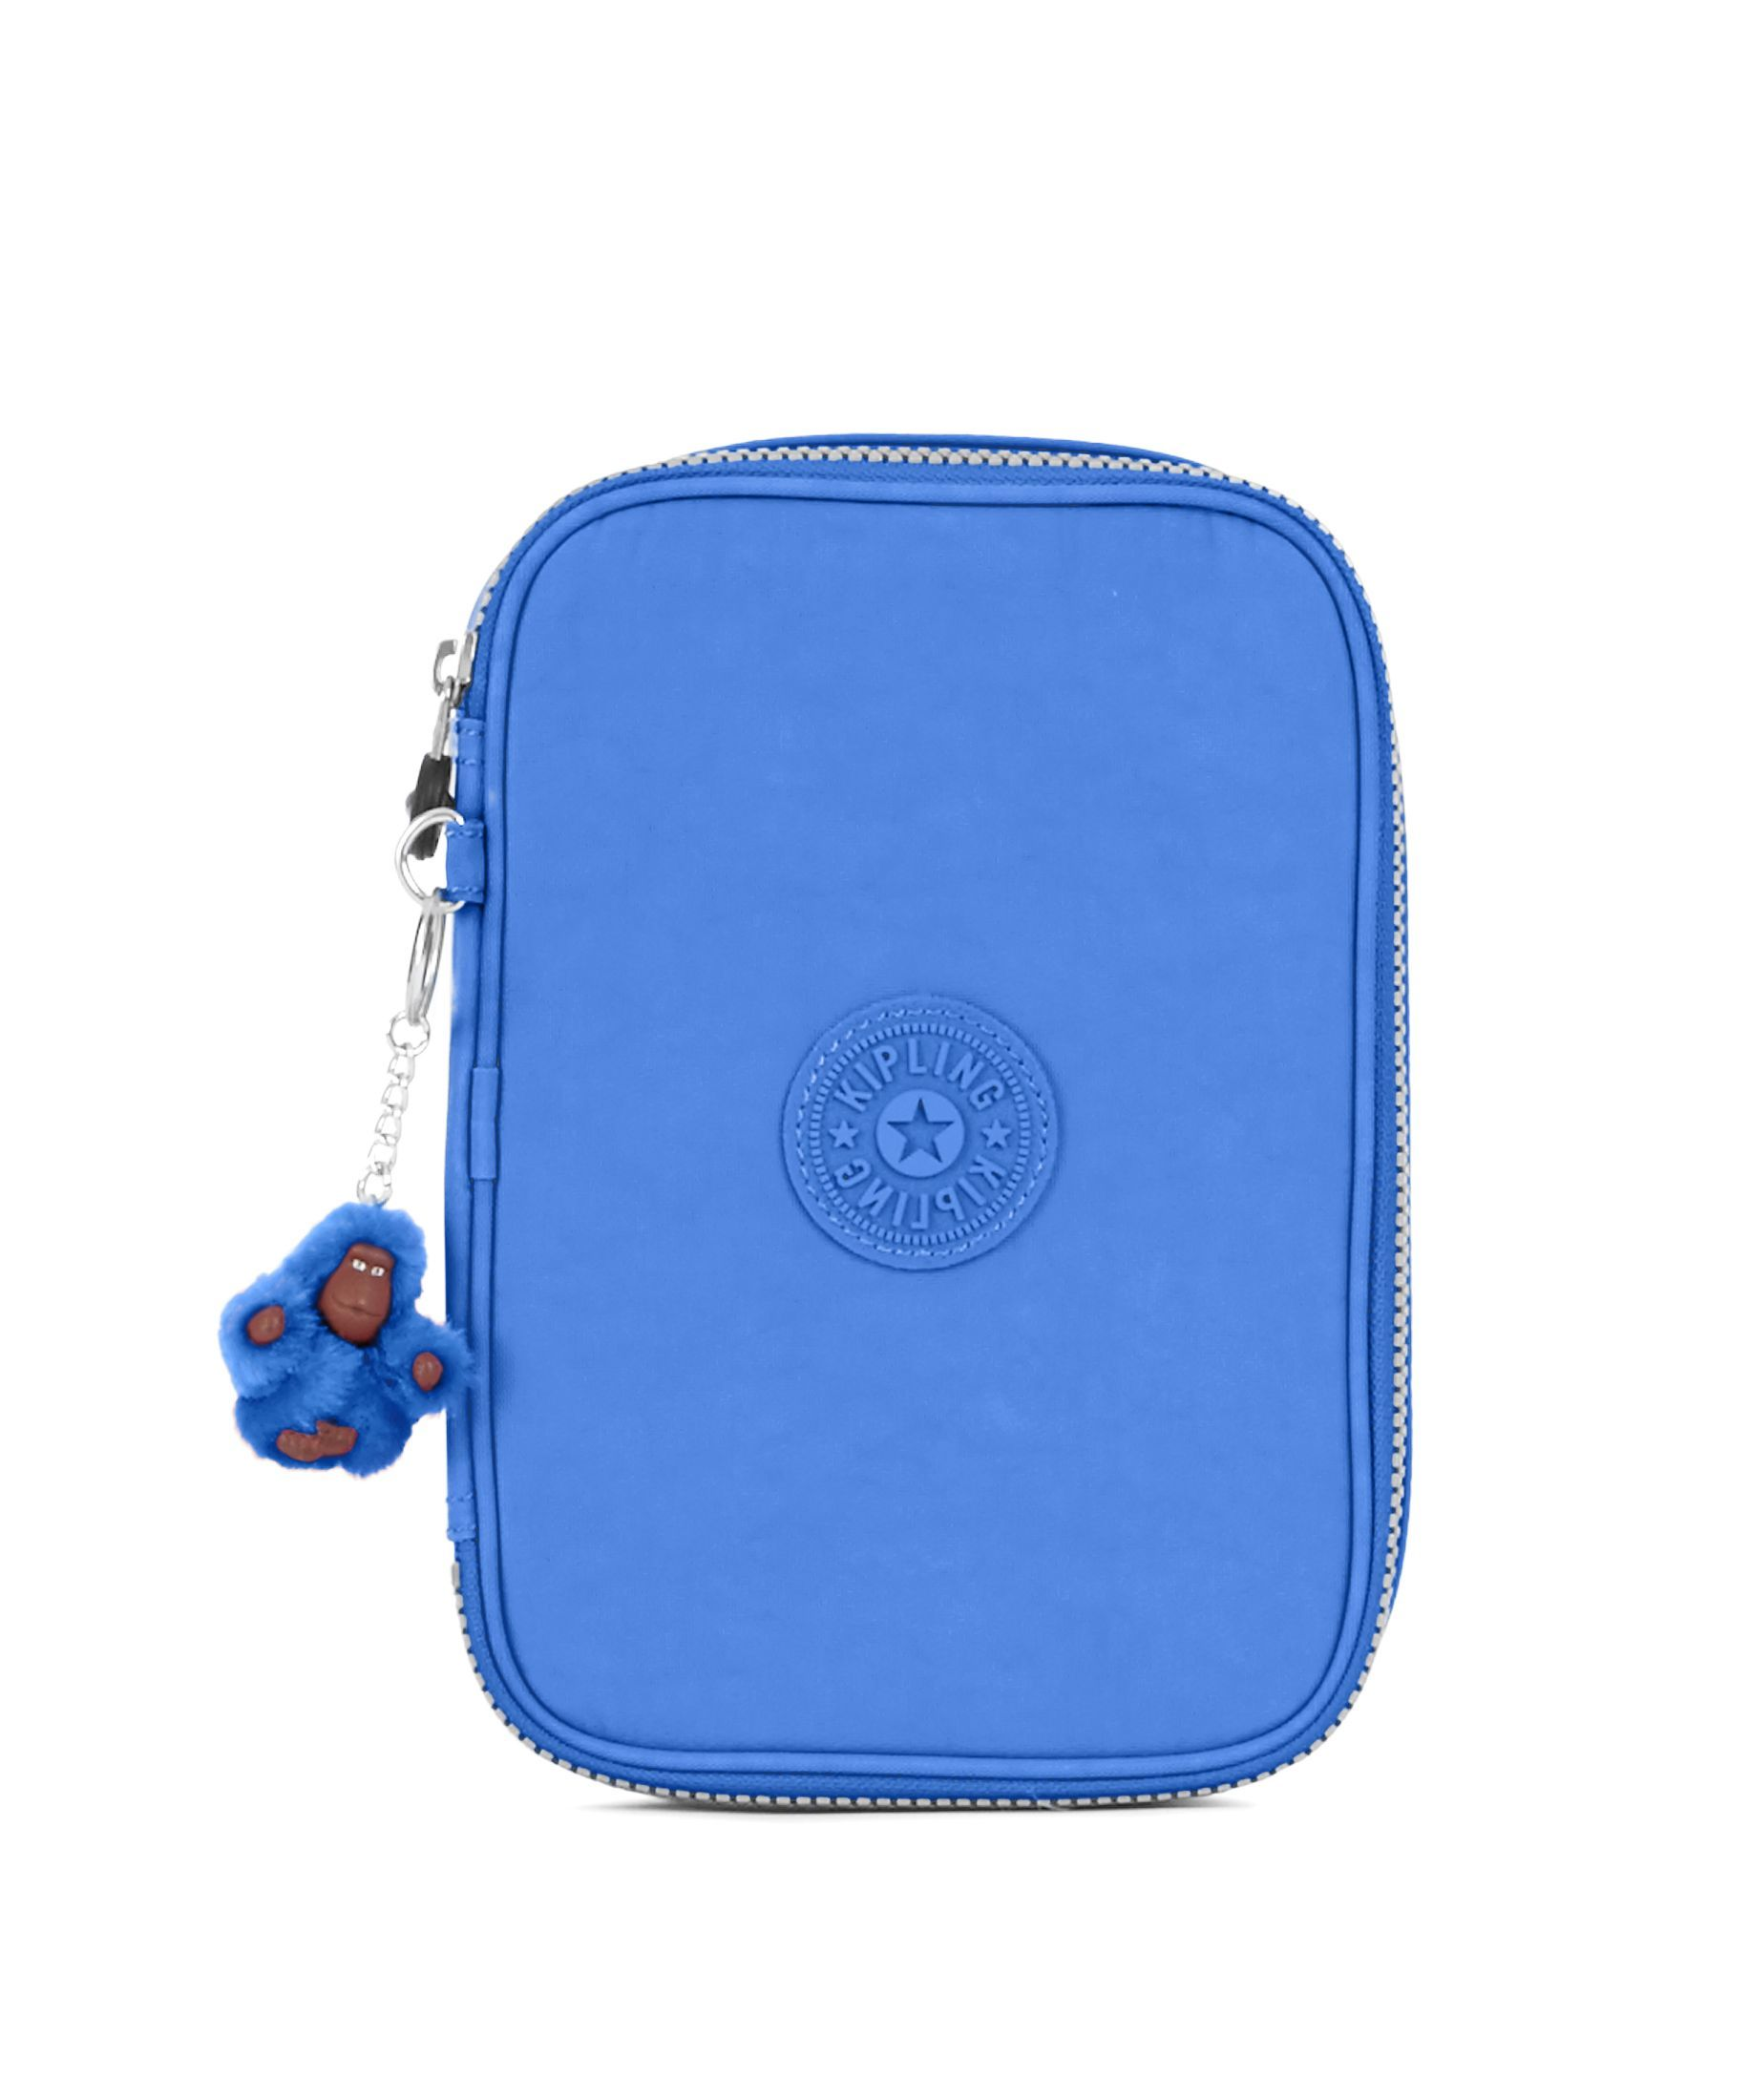 0c0e52f18 100 Pens Case - Sailor Blue | Kipling | Comprar | Estojos kipling ...